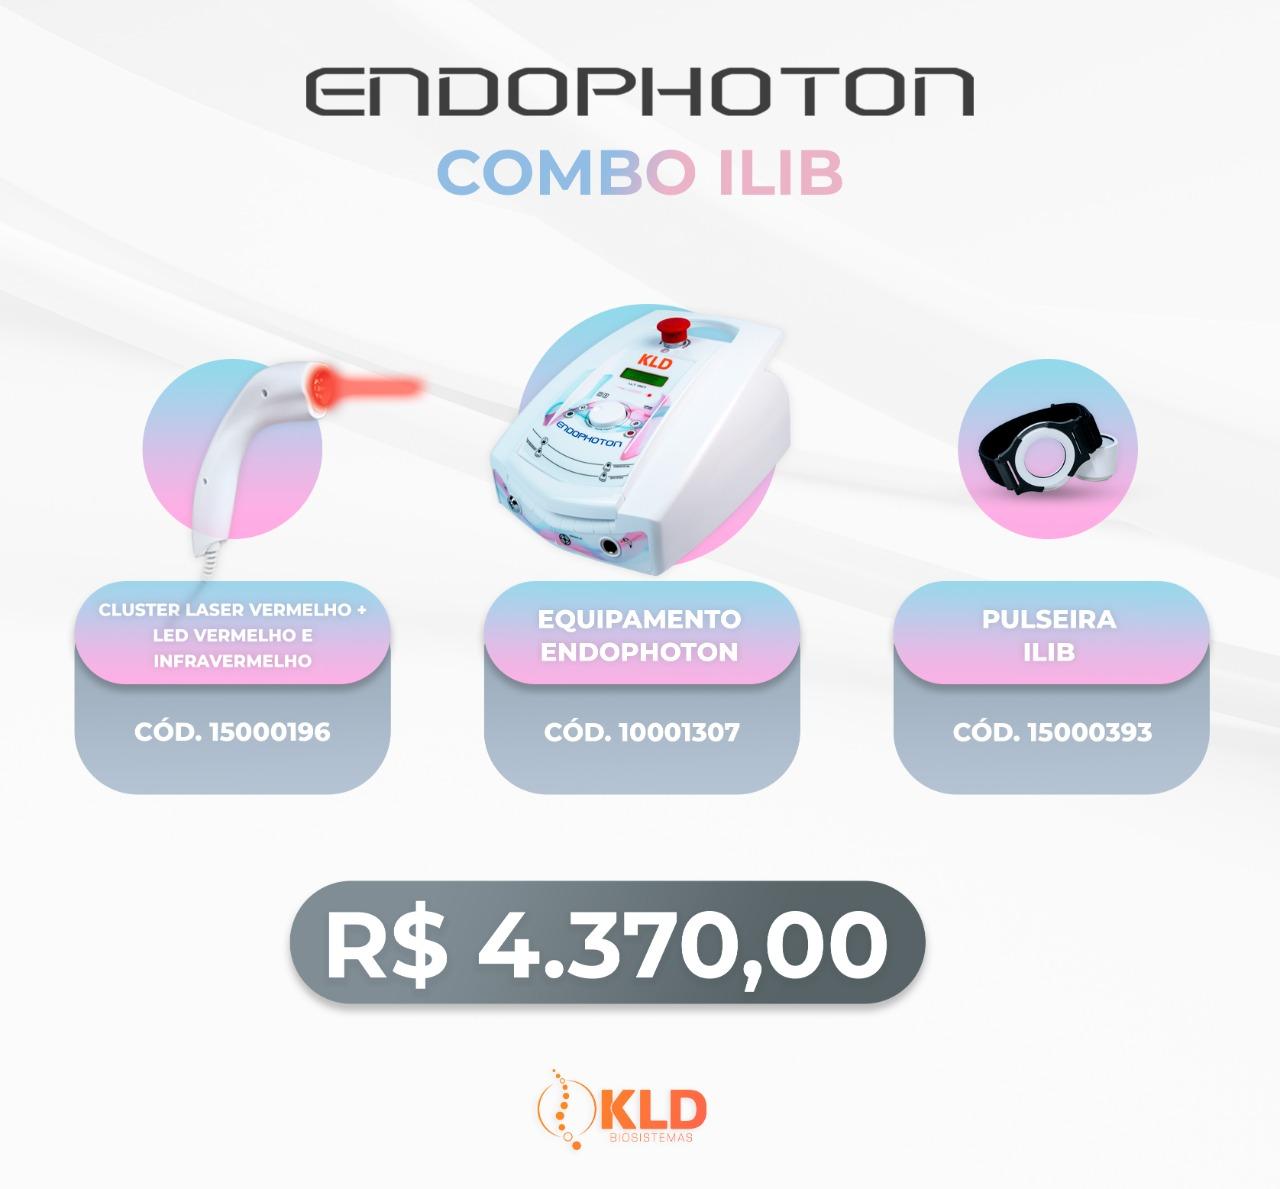 Combo ILIB - Endophoton Fototerapia e laserterapia -  KLD